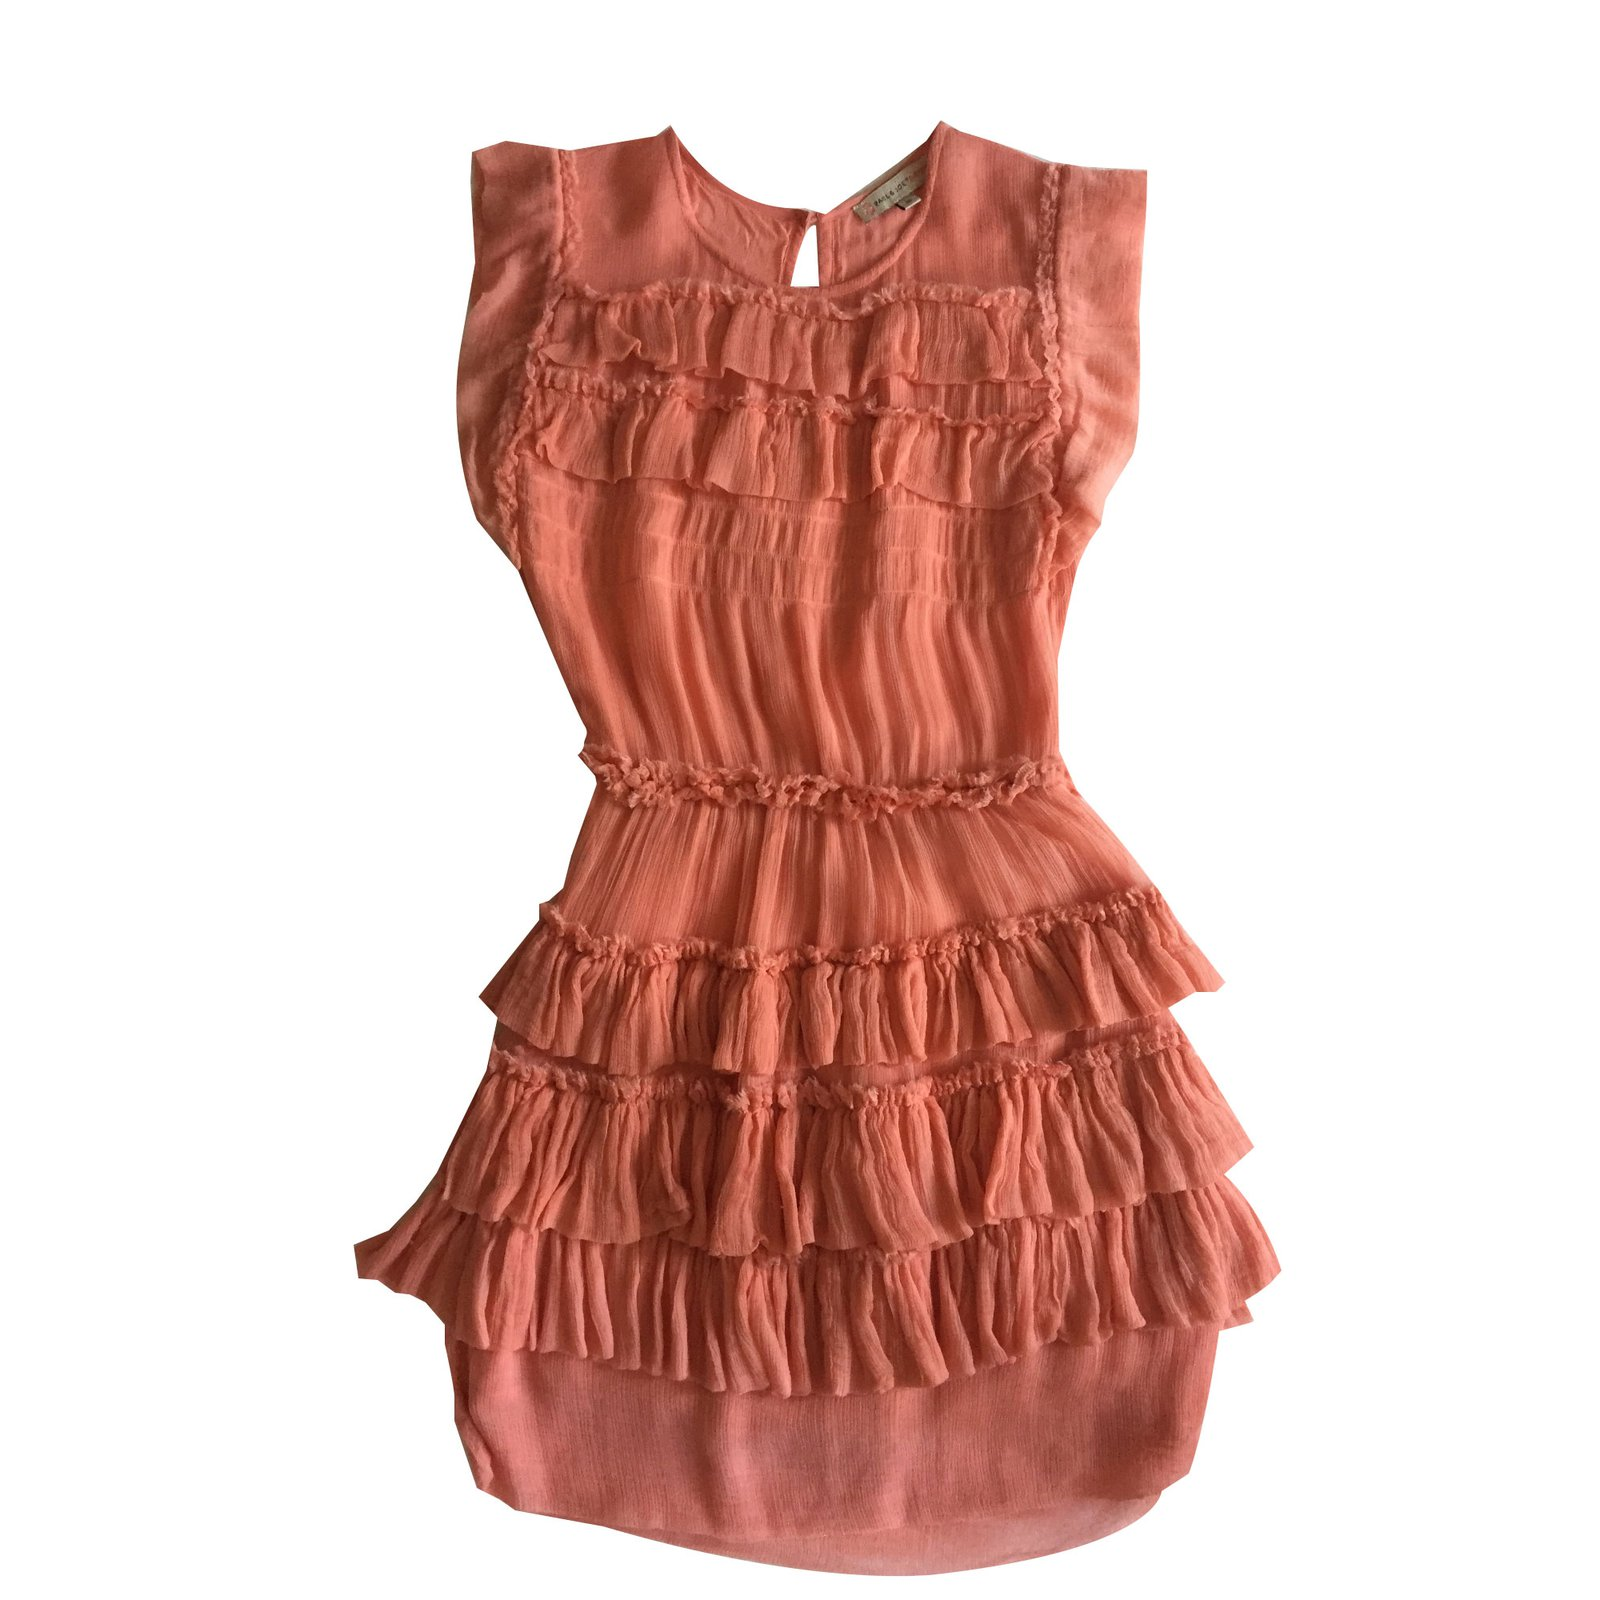 Paul Joe Sister Dress Dresses Other C Ref 69639